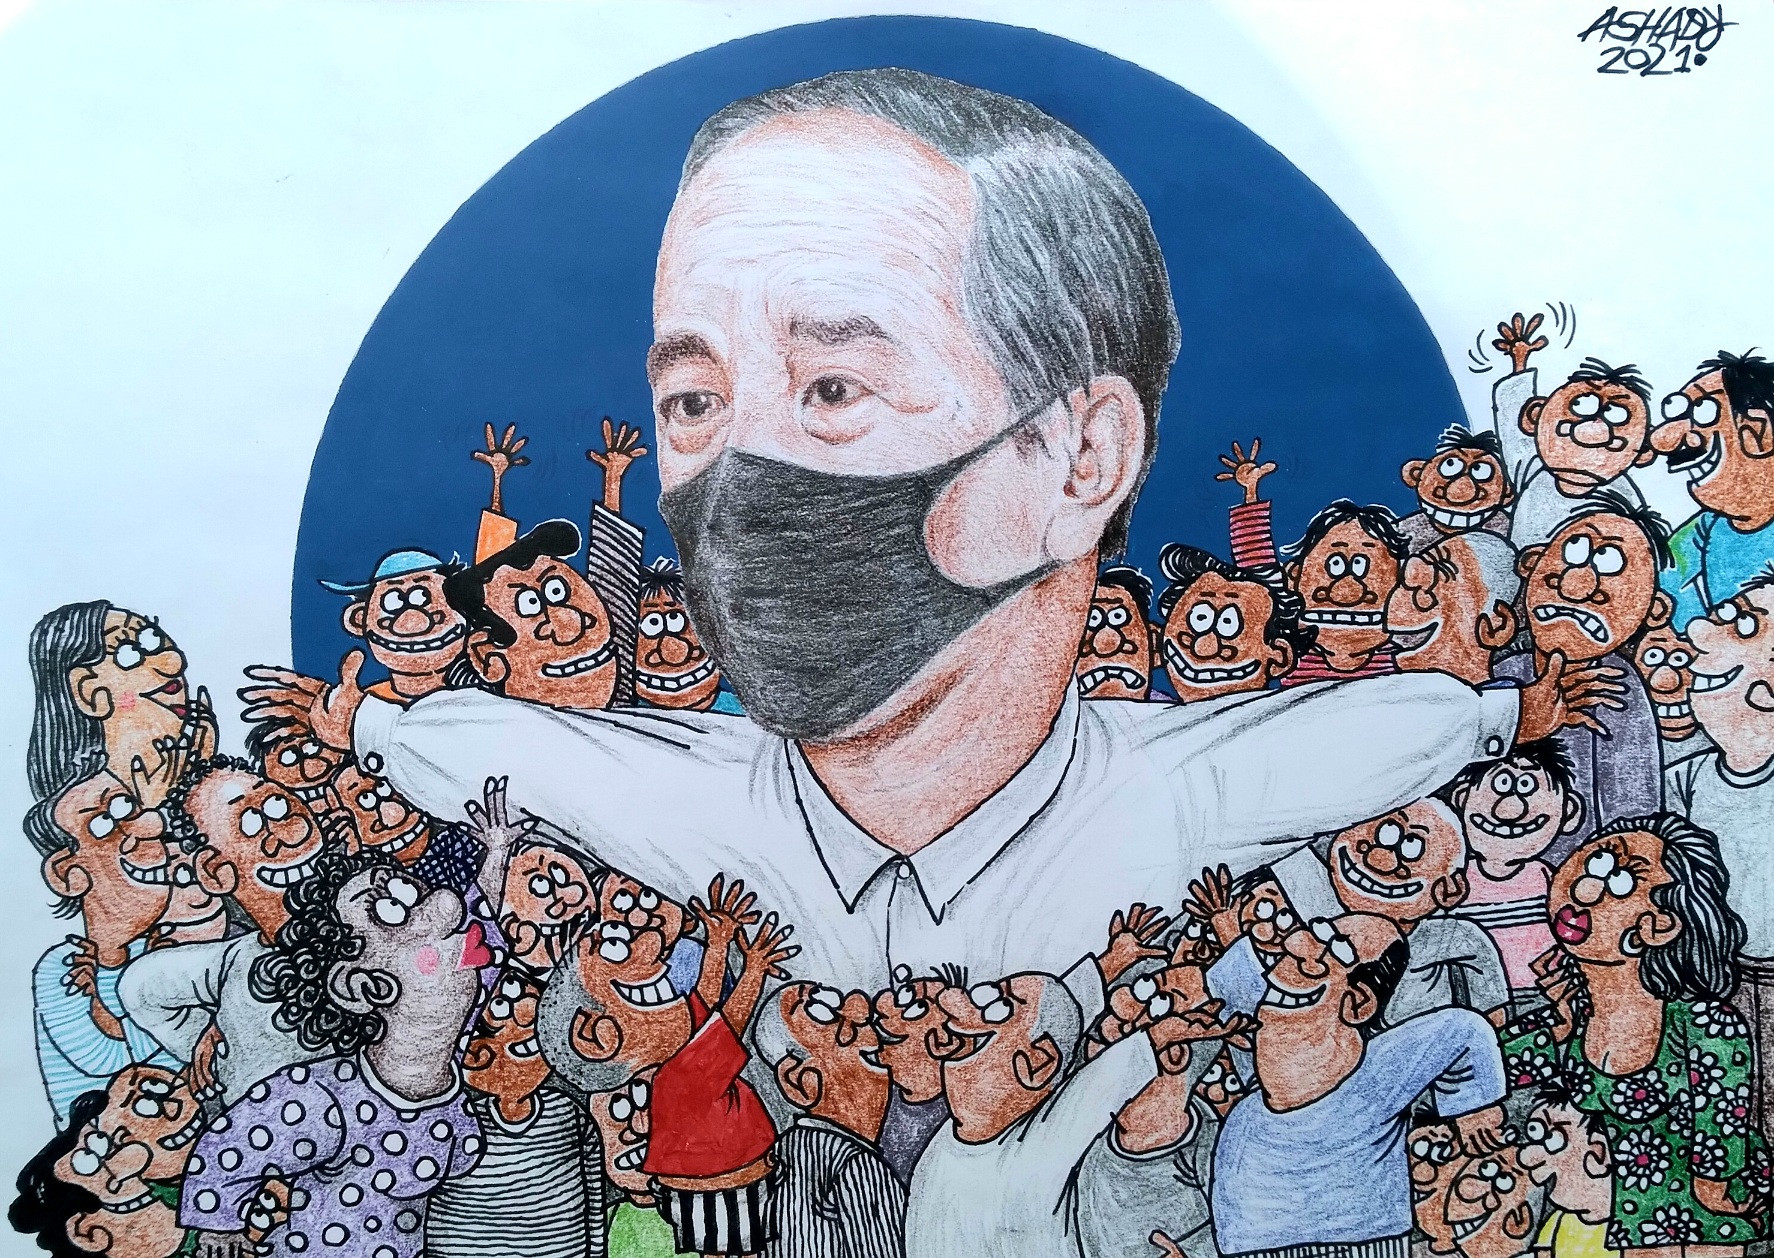 Ngebet Lihat Jokowi. Karikatur oleh Ashady - JPNN.com